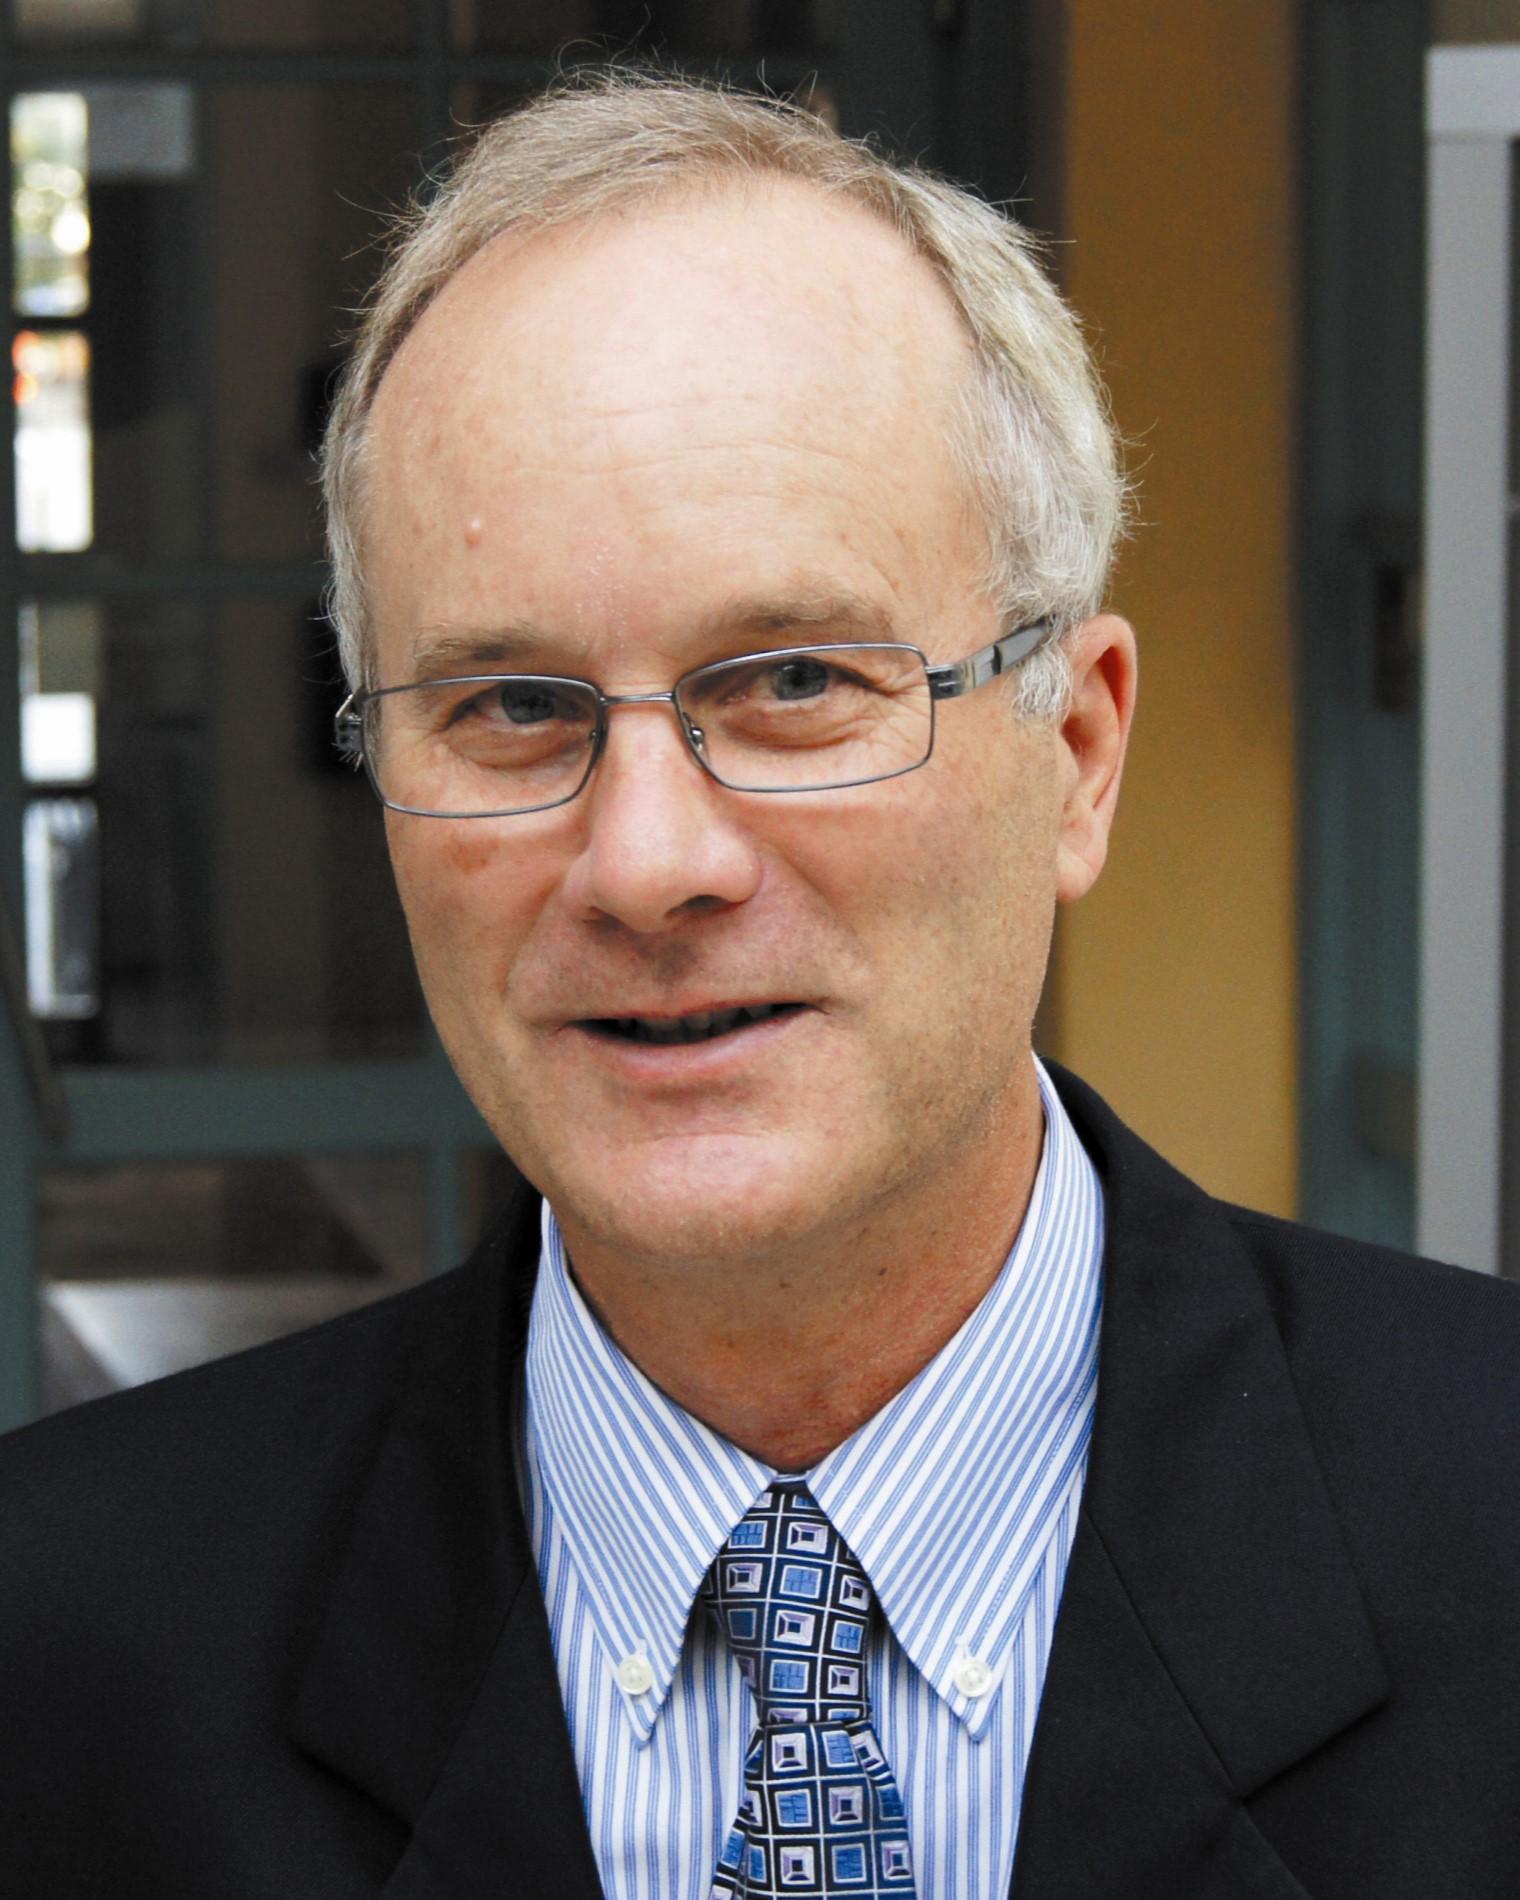 J. Curtis NICKEL, MD